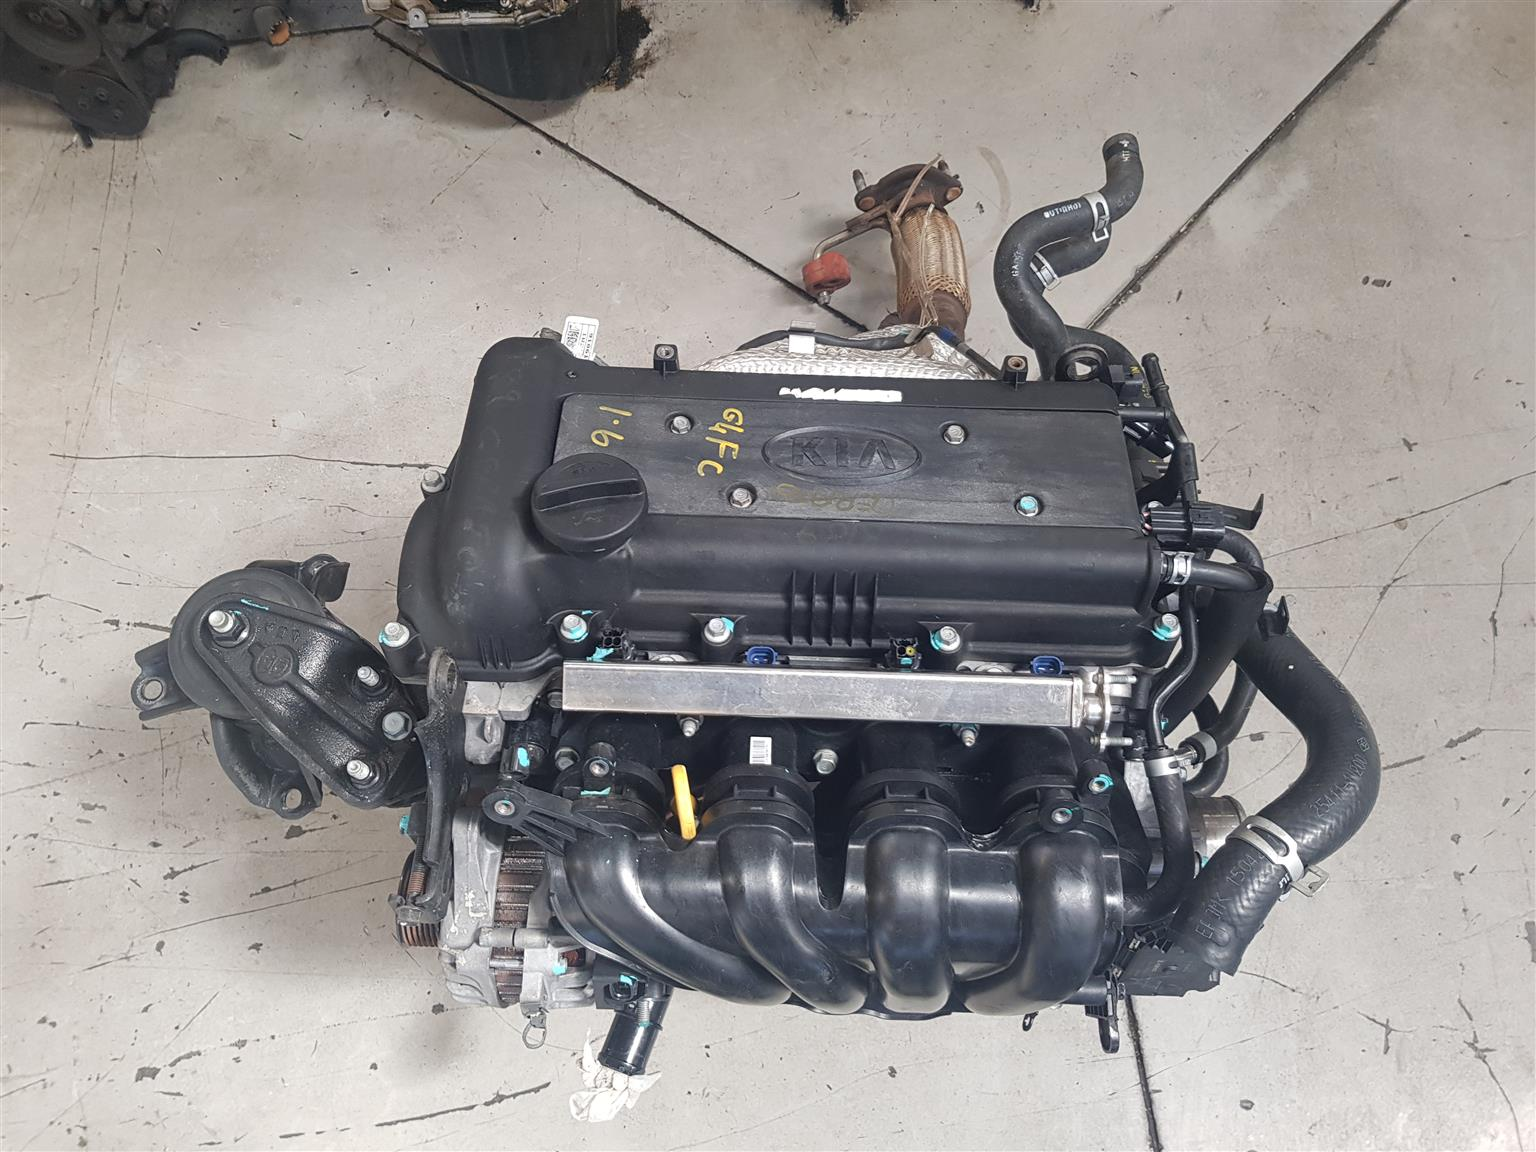 HYUNDAI I20 1.6 (G4FC) ENGINE FOR SALE